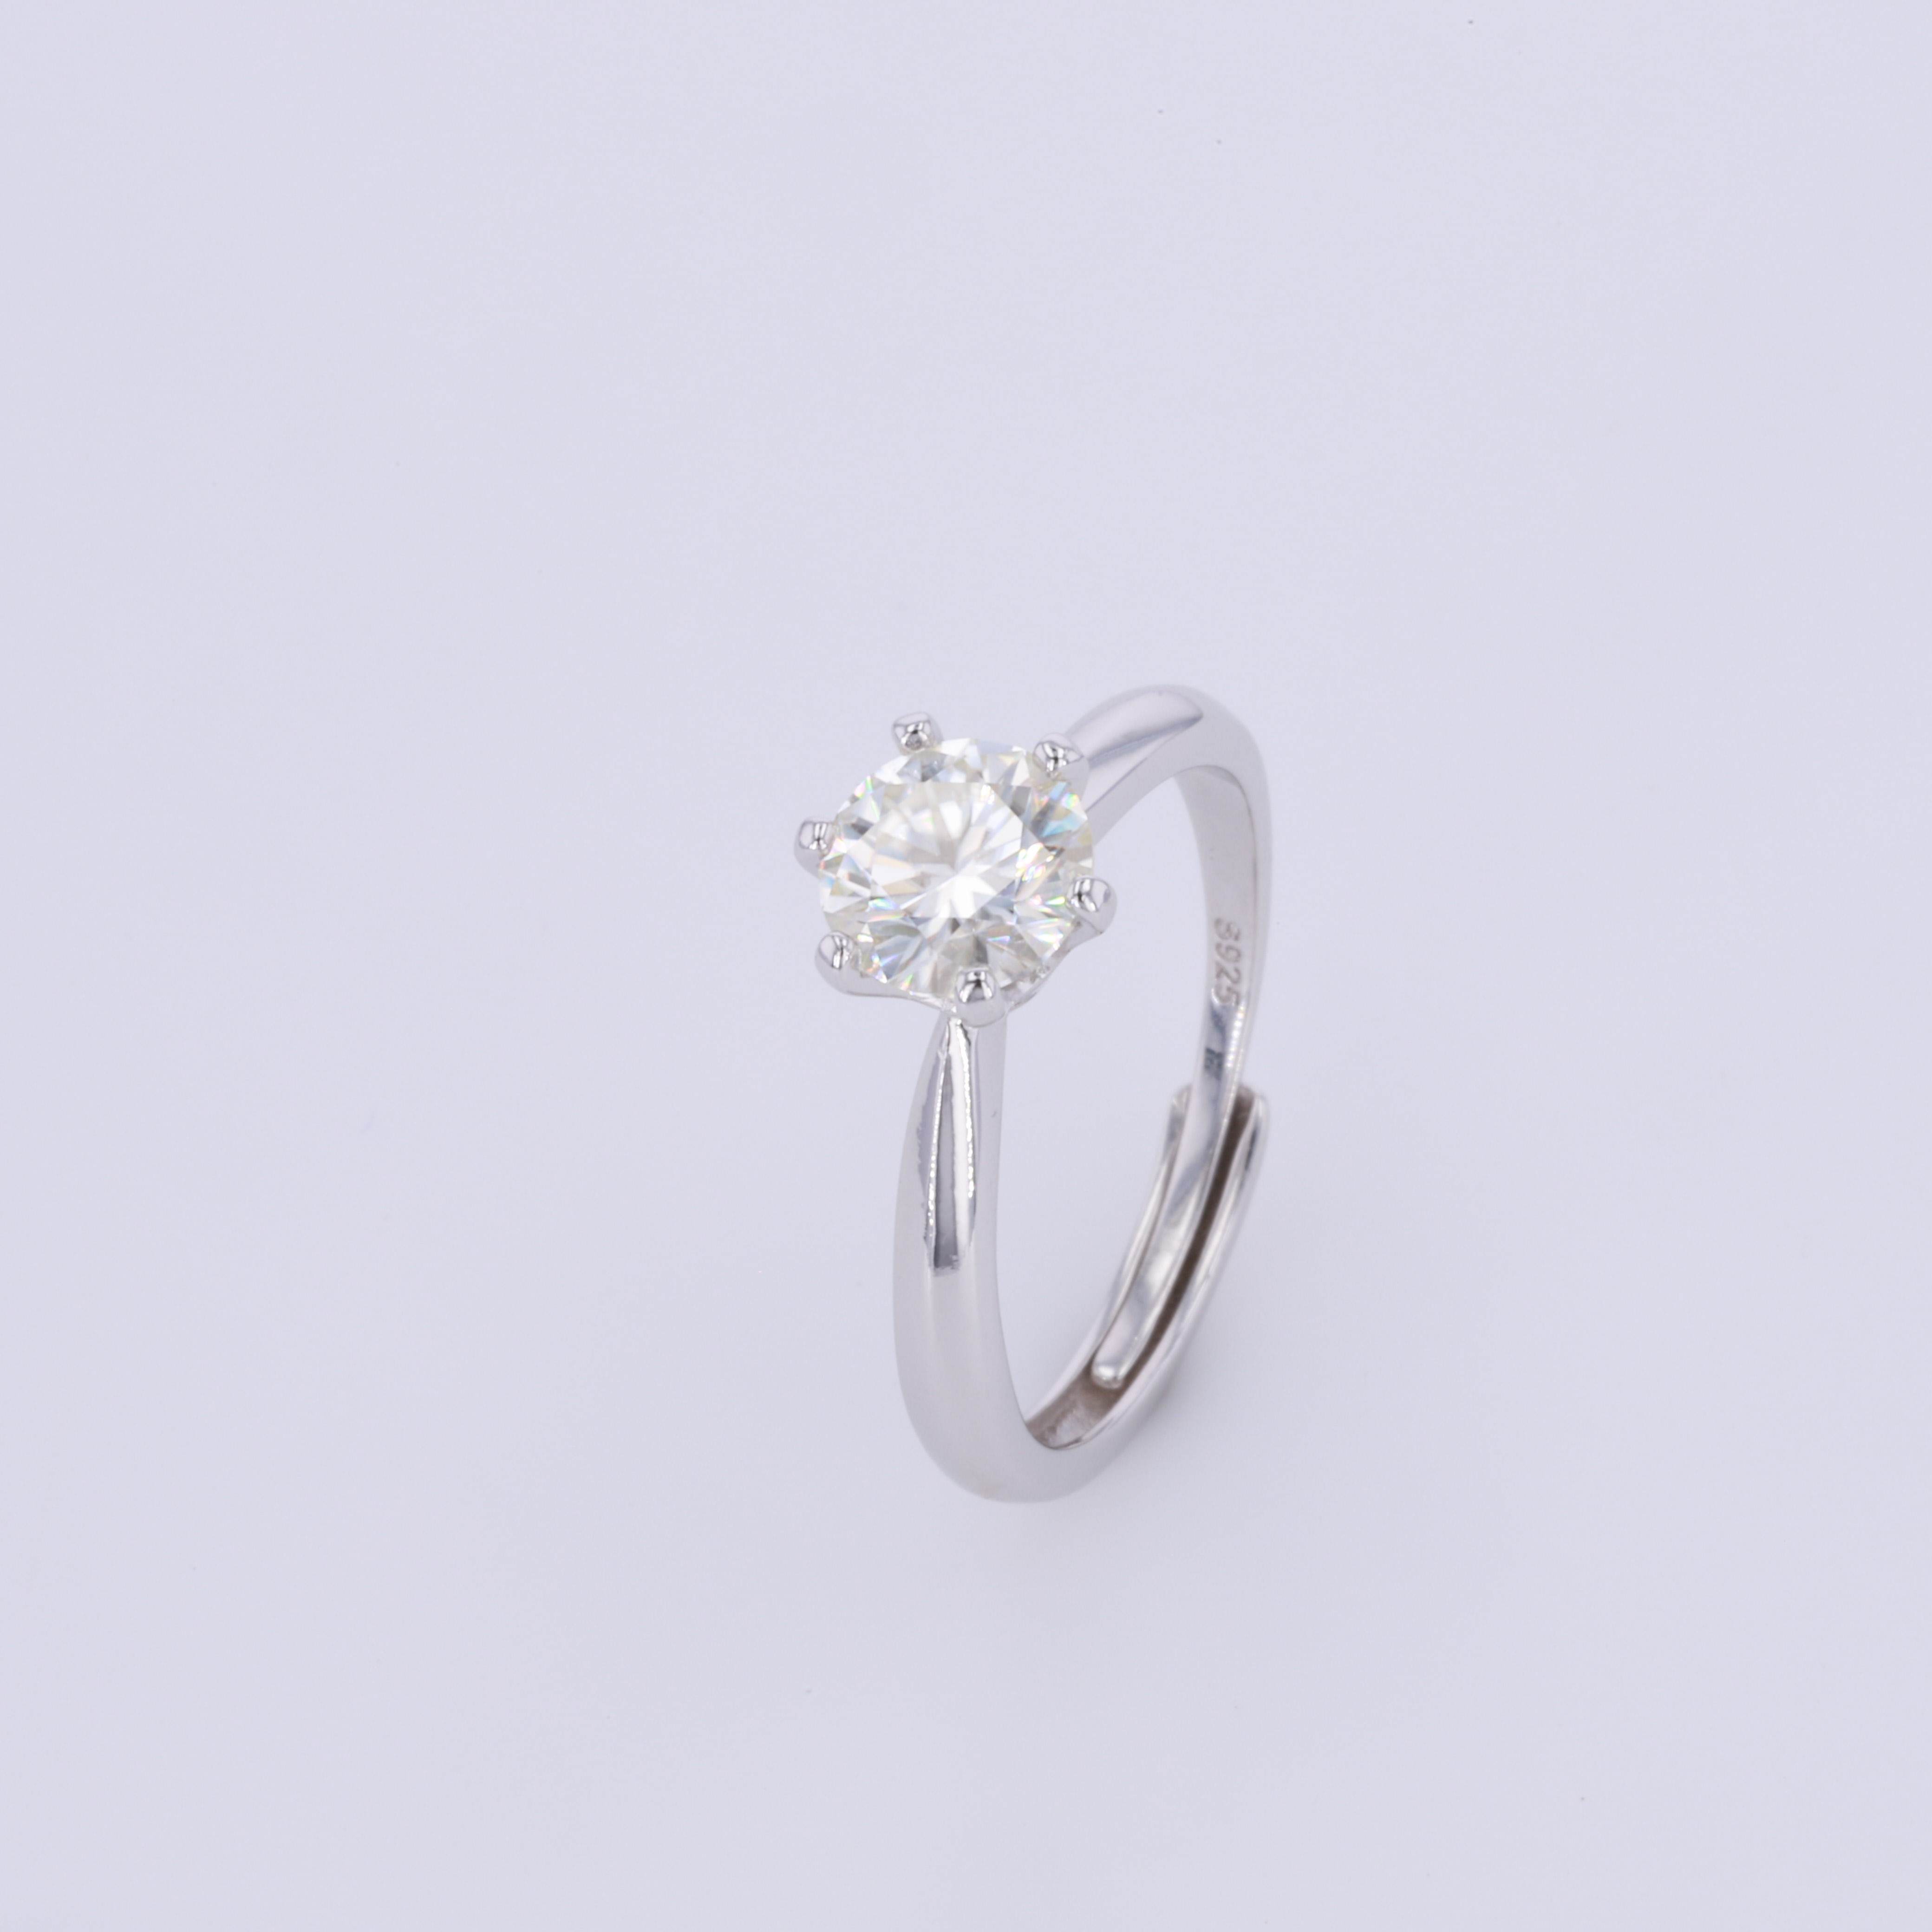 Resizable 925 Sterling Silver Ring 1ct Moissanites Ring Engagement Wedding Diamond Ring For Women Adjustable